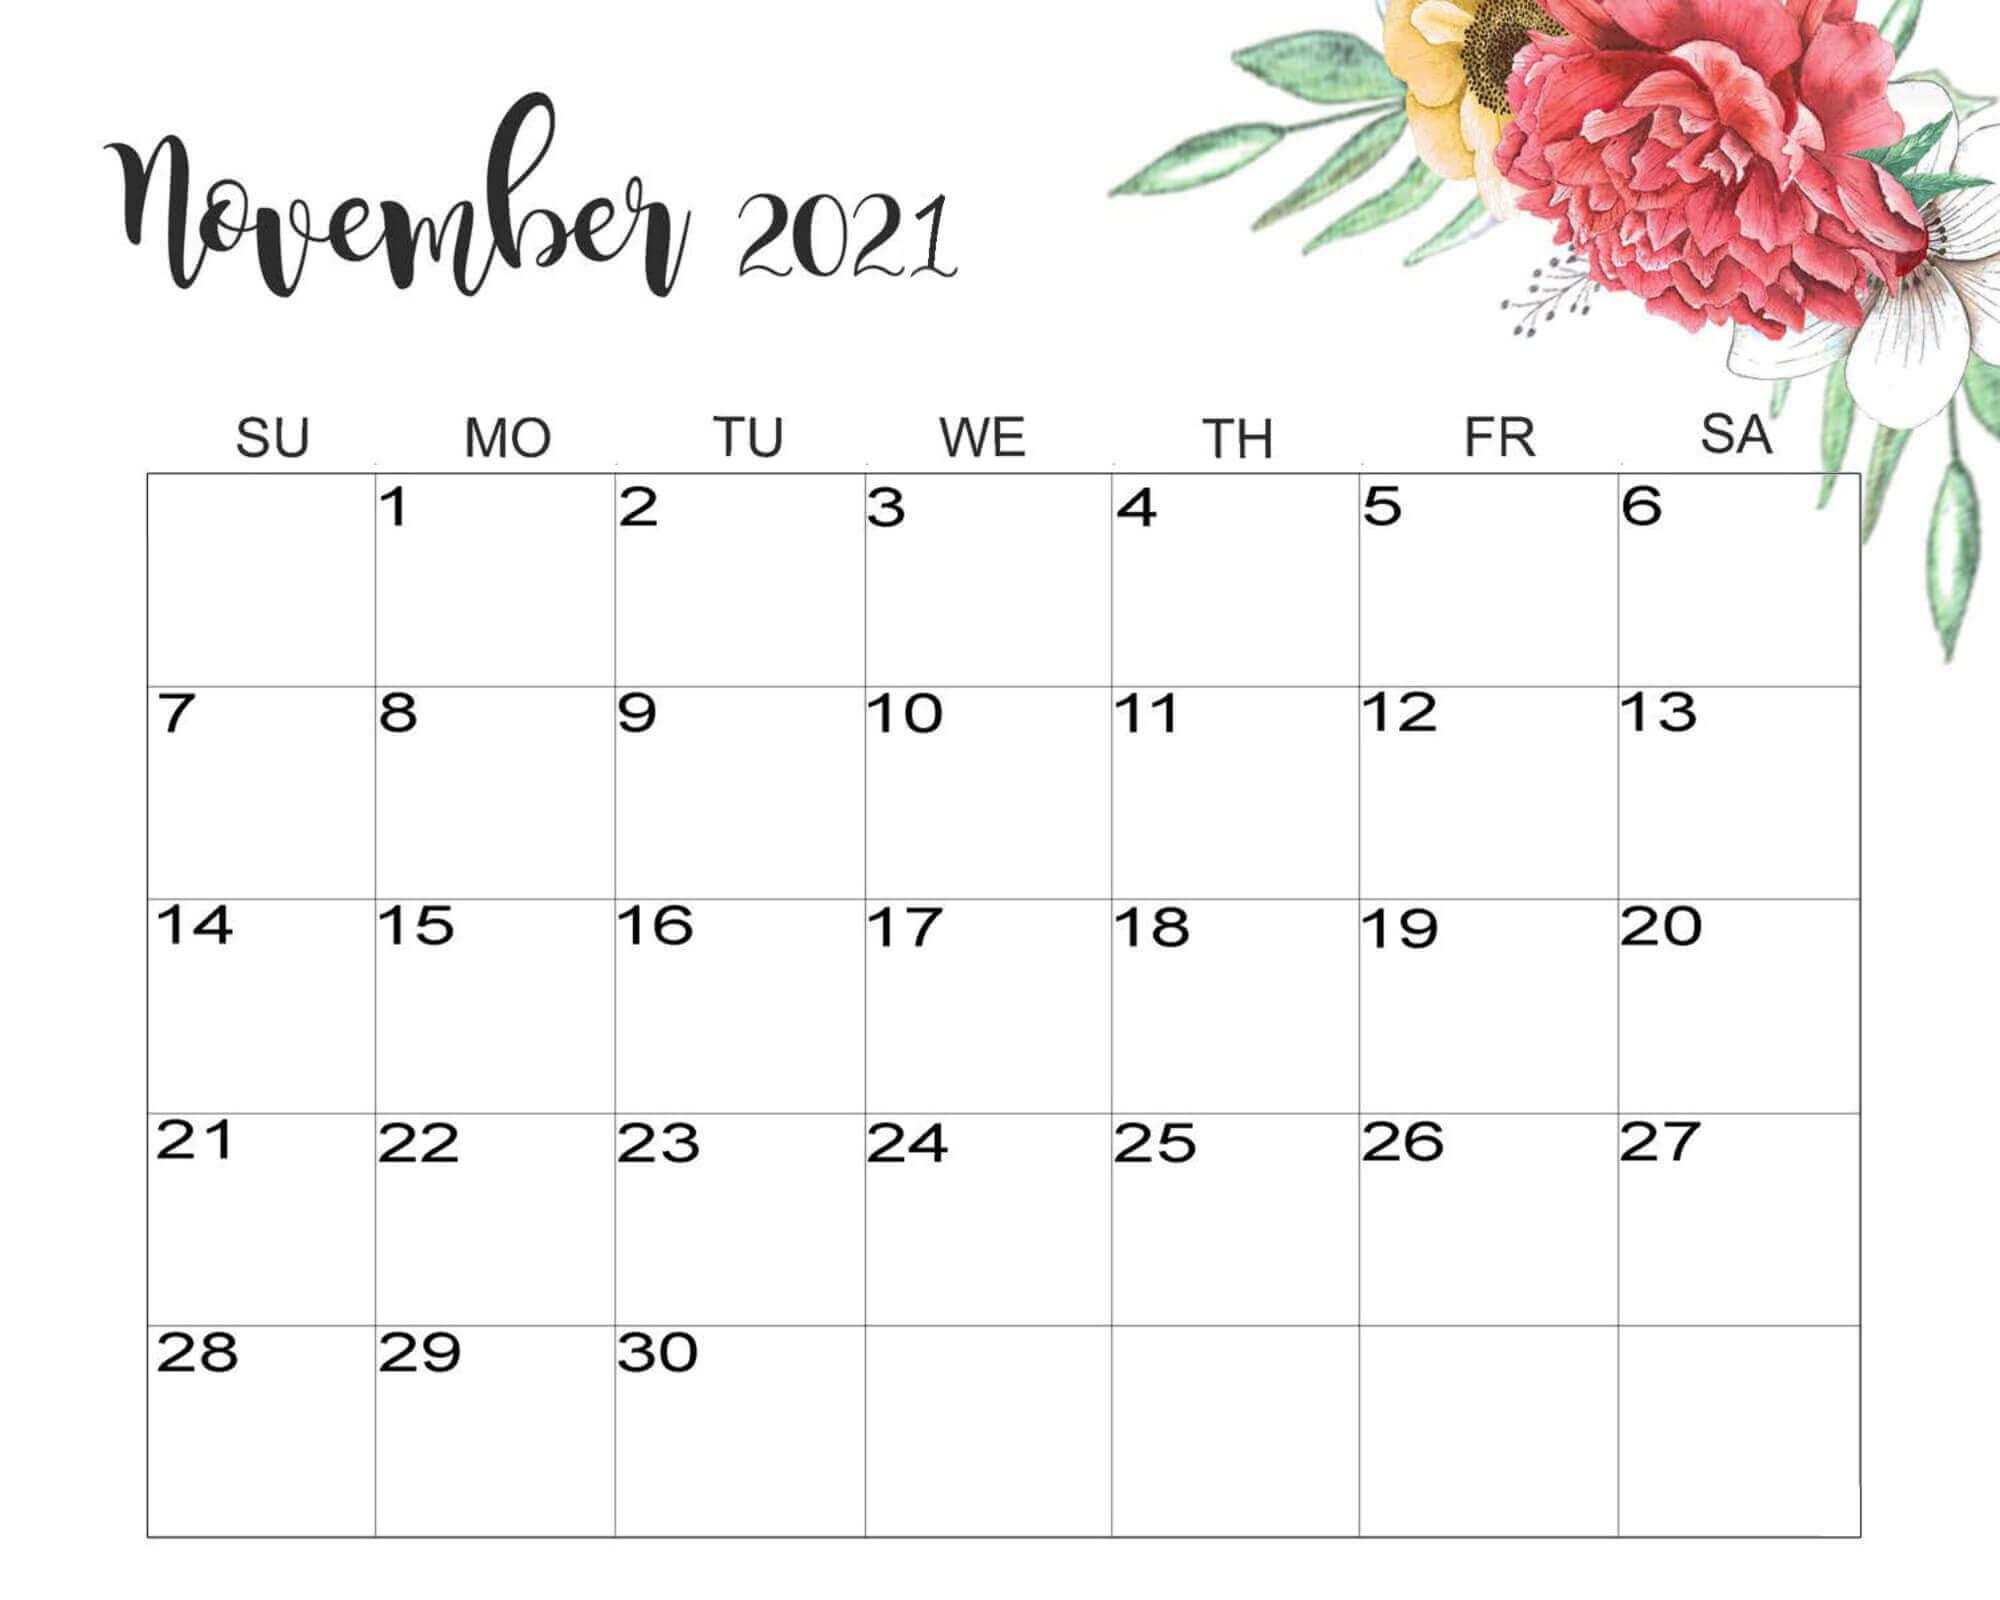 2021 November Floral Calendar